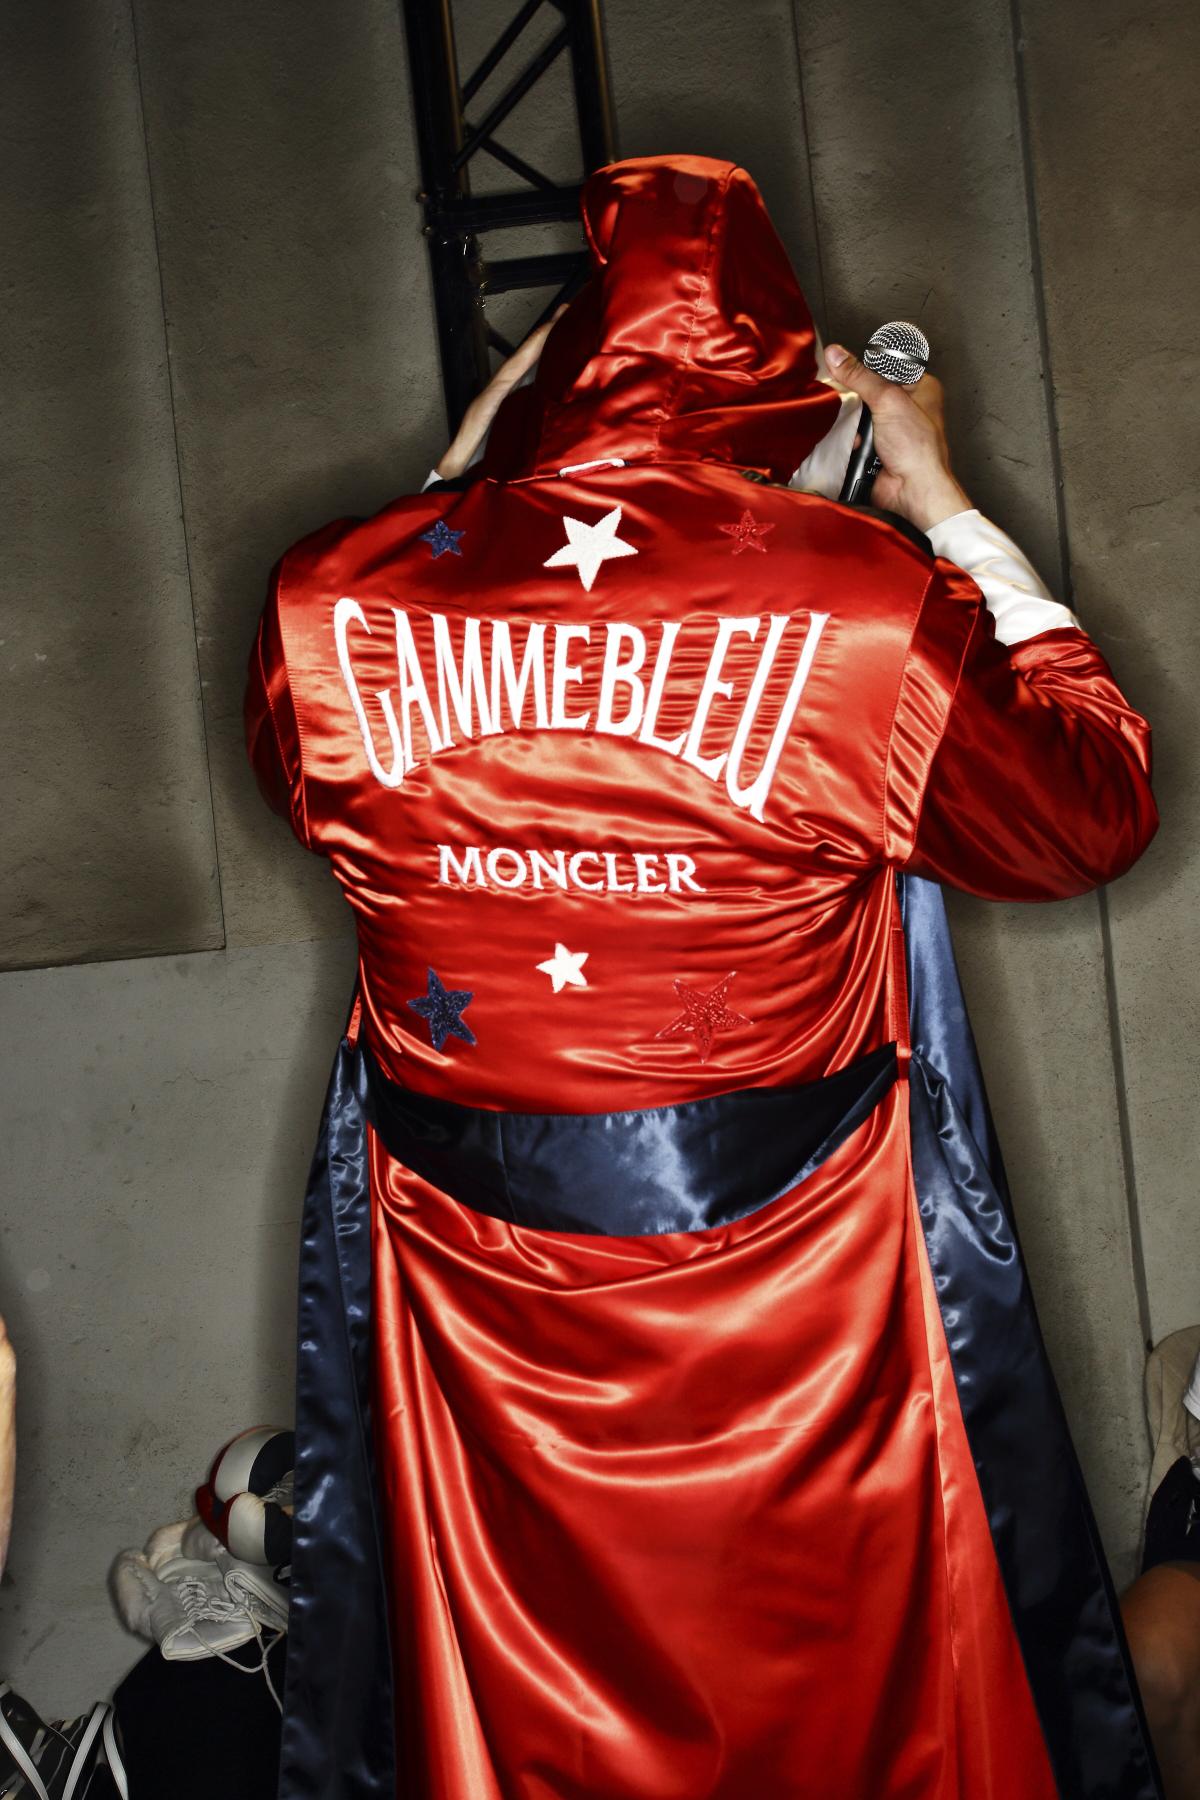 Moncler Gamme Blue SS15 Fashion Show Milan Backstage